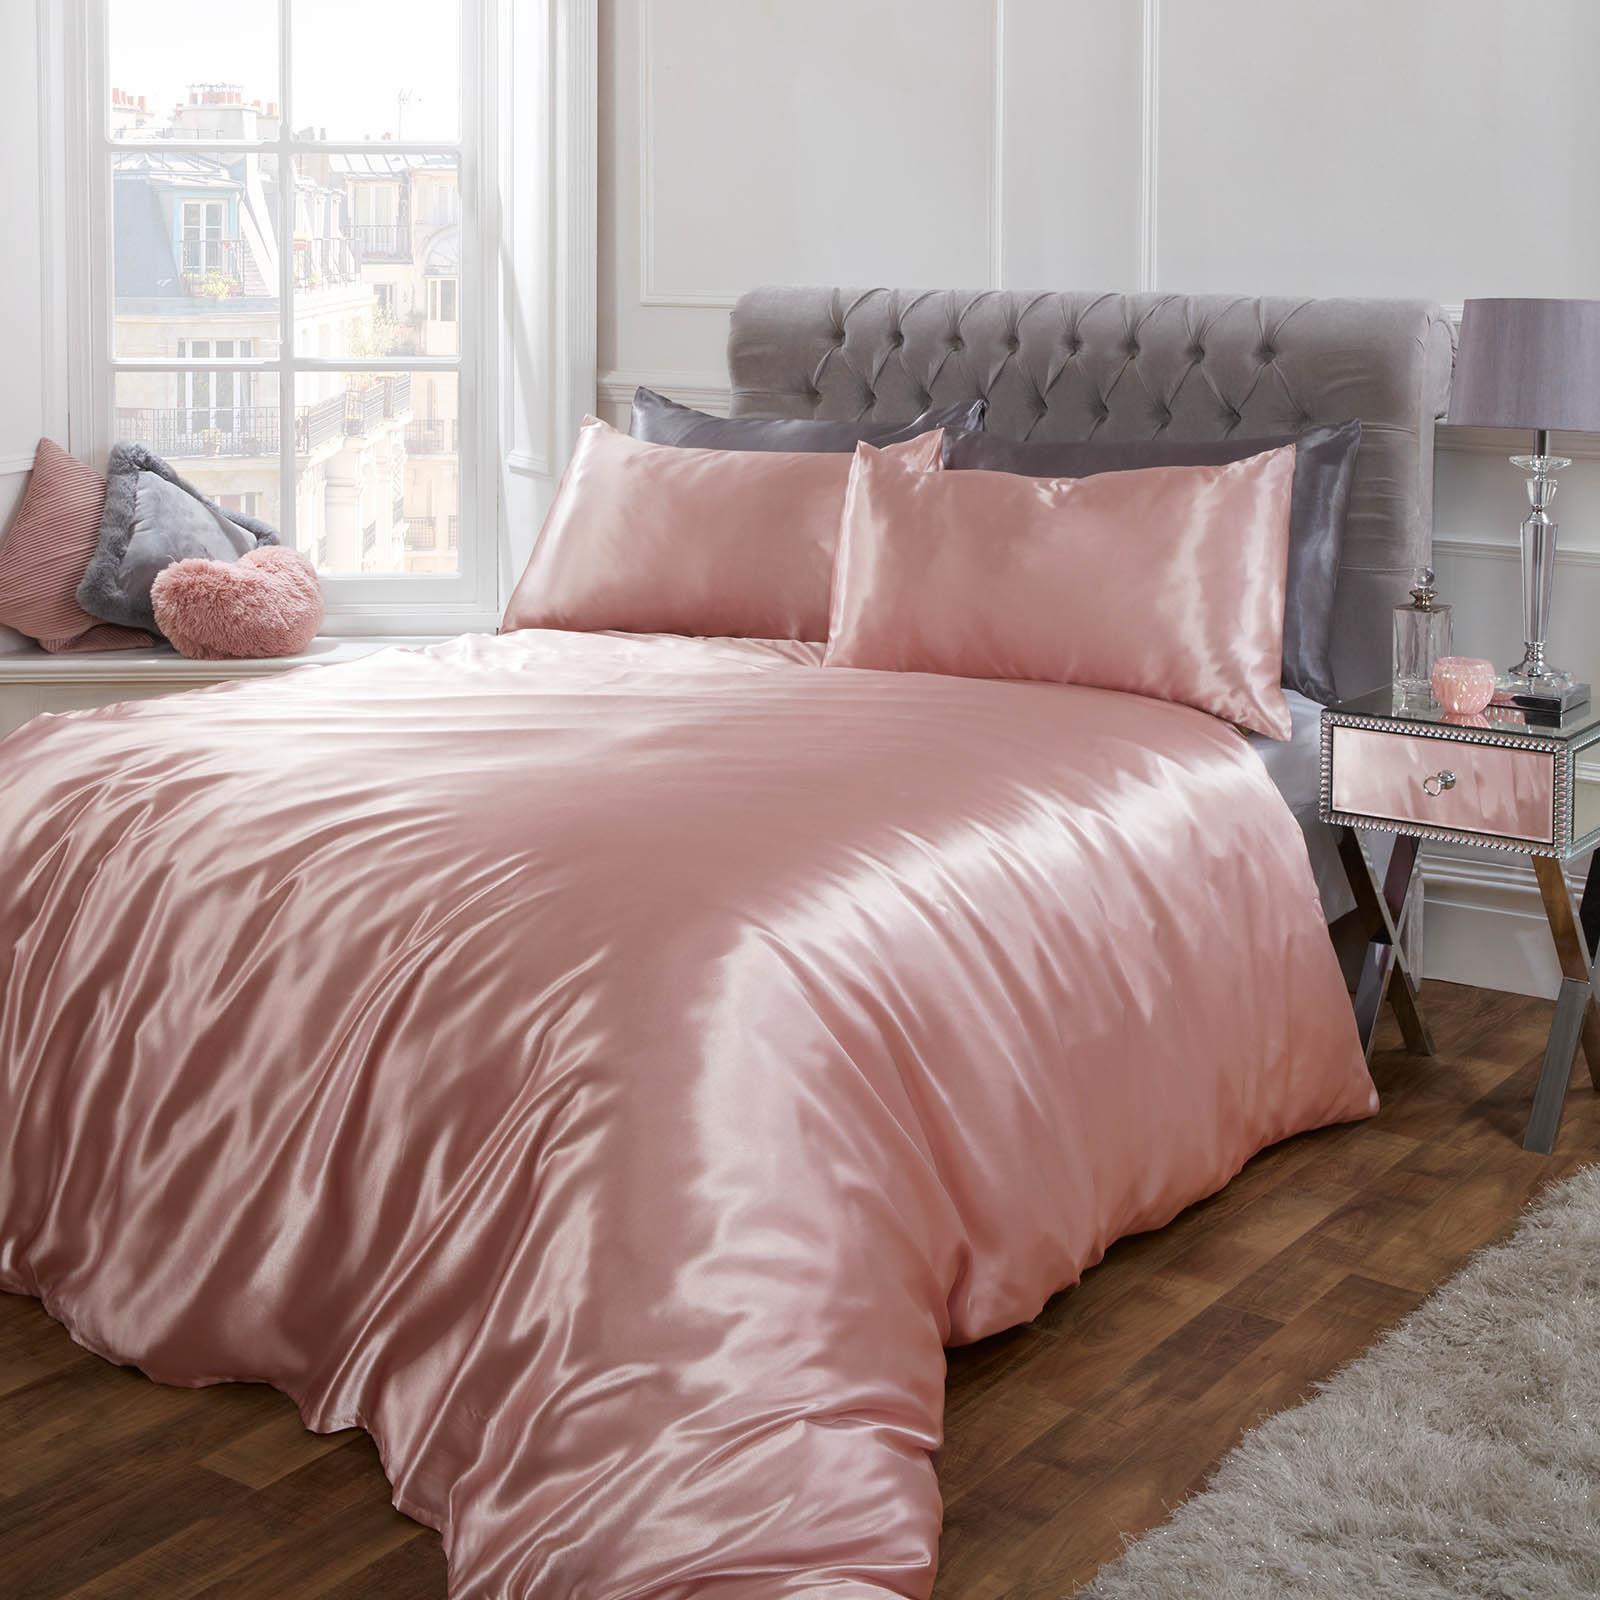 thumbnail 11 - Sienna Satin Silk Duvet Cover with Pillowcases Bedding Set, Blush Pink Silver